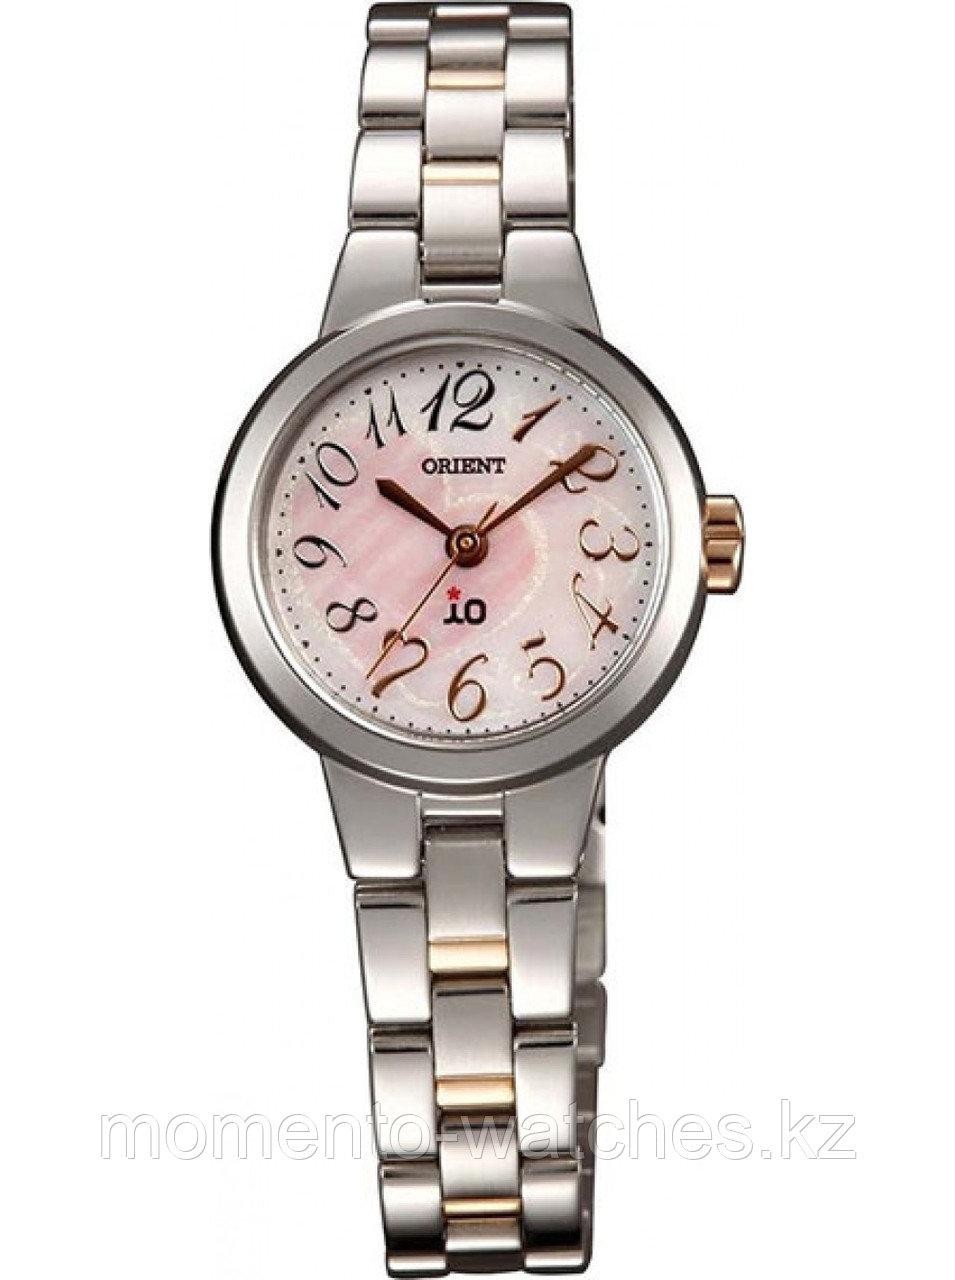 Женские часы Orient SWD02001W0